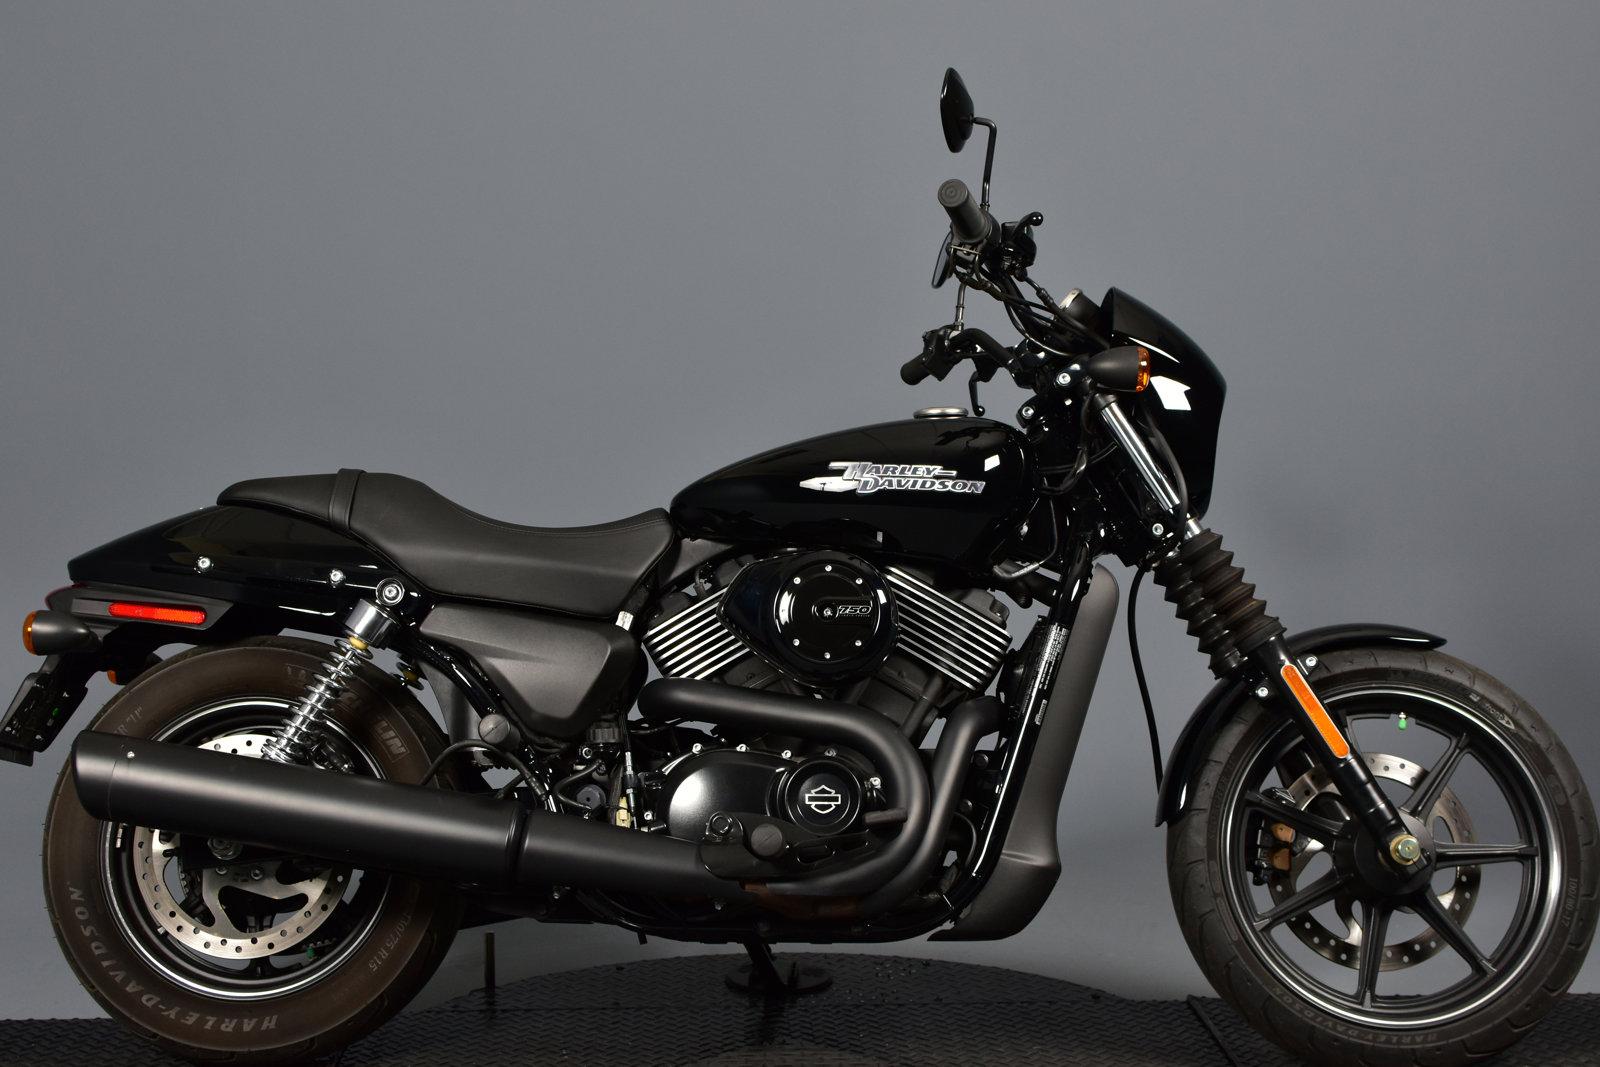 Pre-Owned 2020 Harley-Davidson Street 750 XG750